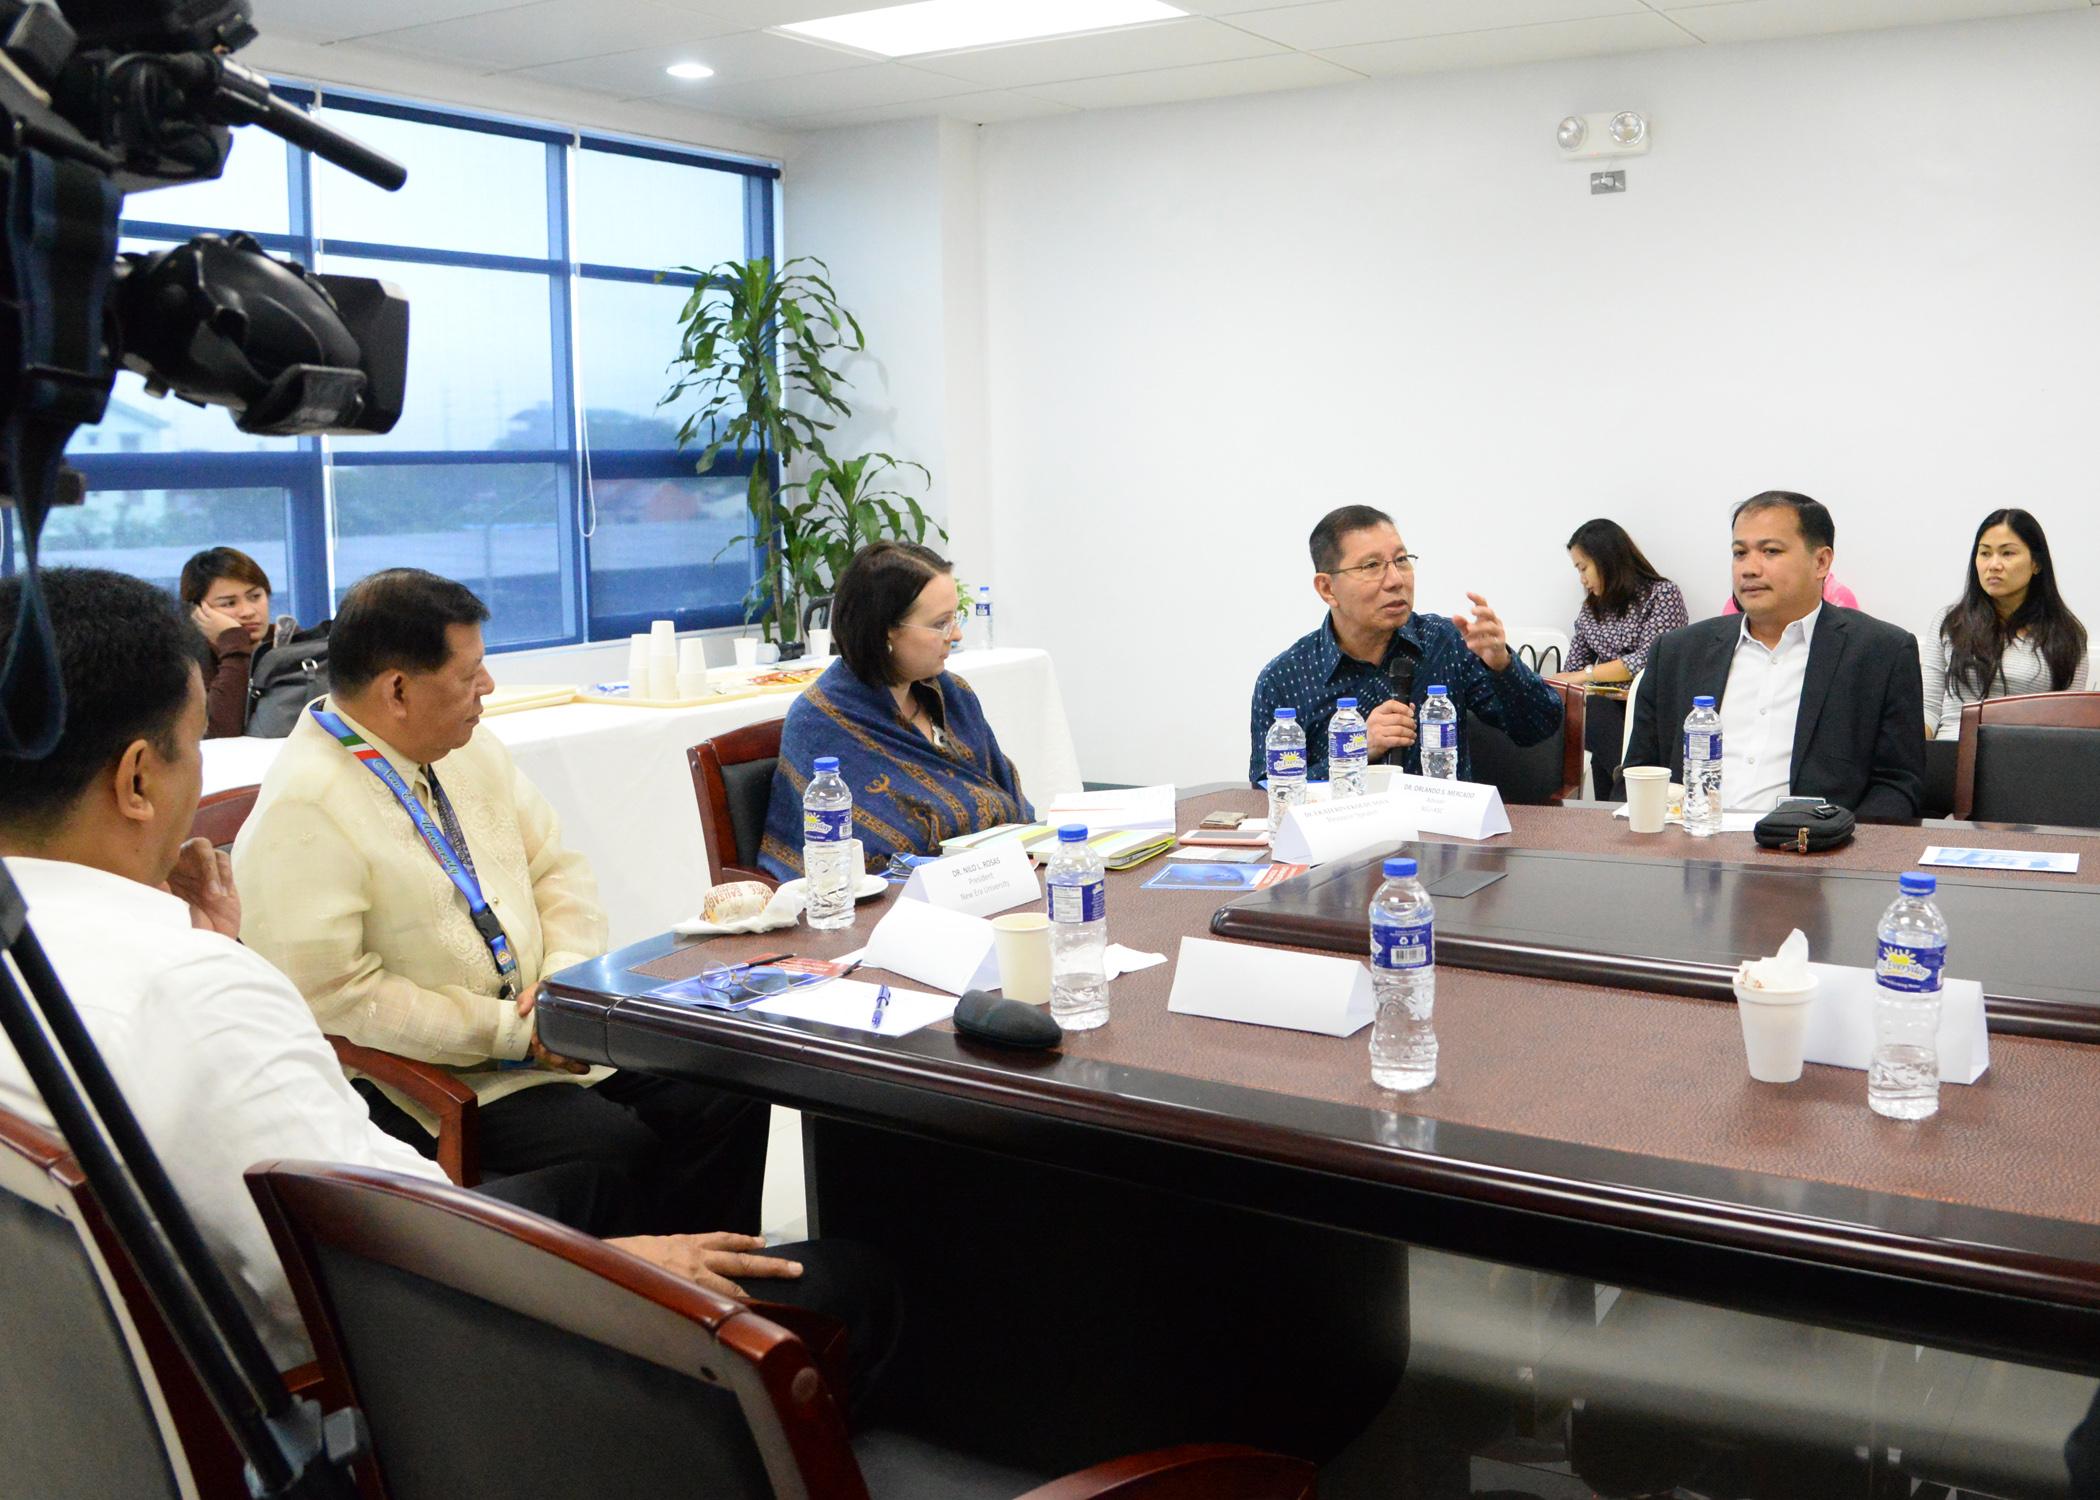 Former Senator Orlando Mercado stresses a point during the NEU Asean Studies Center's roundtable discussion on Friday. November 25, 2016.